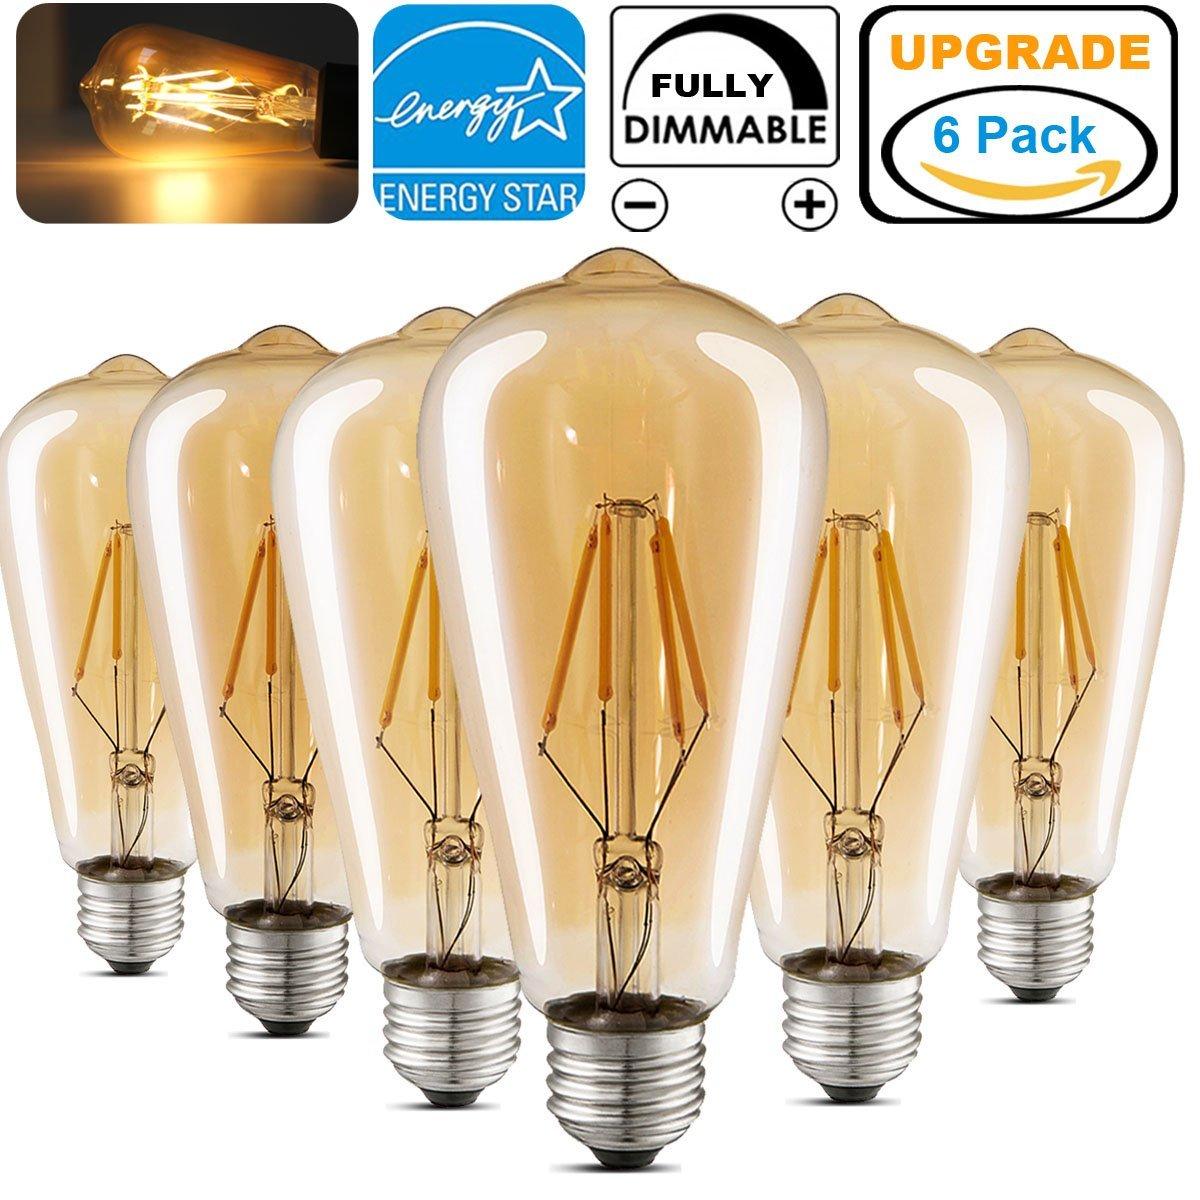 Luxon @ Amazon: Edison LED E26 Light Bulb, 6 Pack, $15.95 AC/Shipping